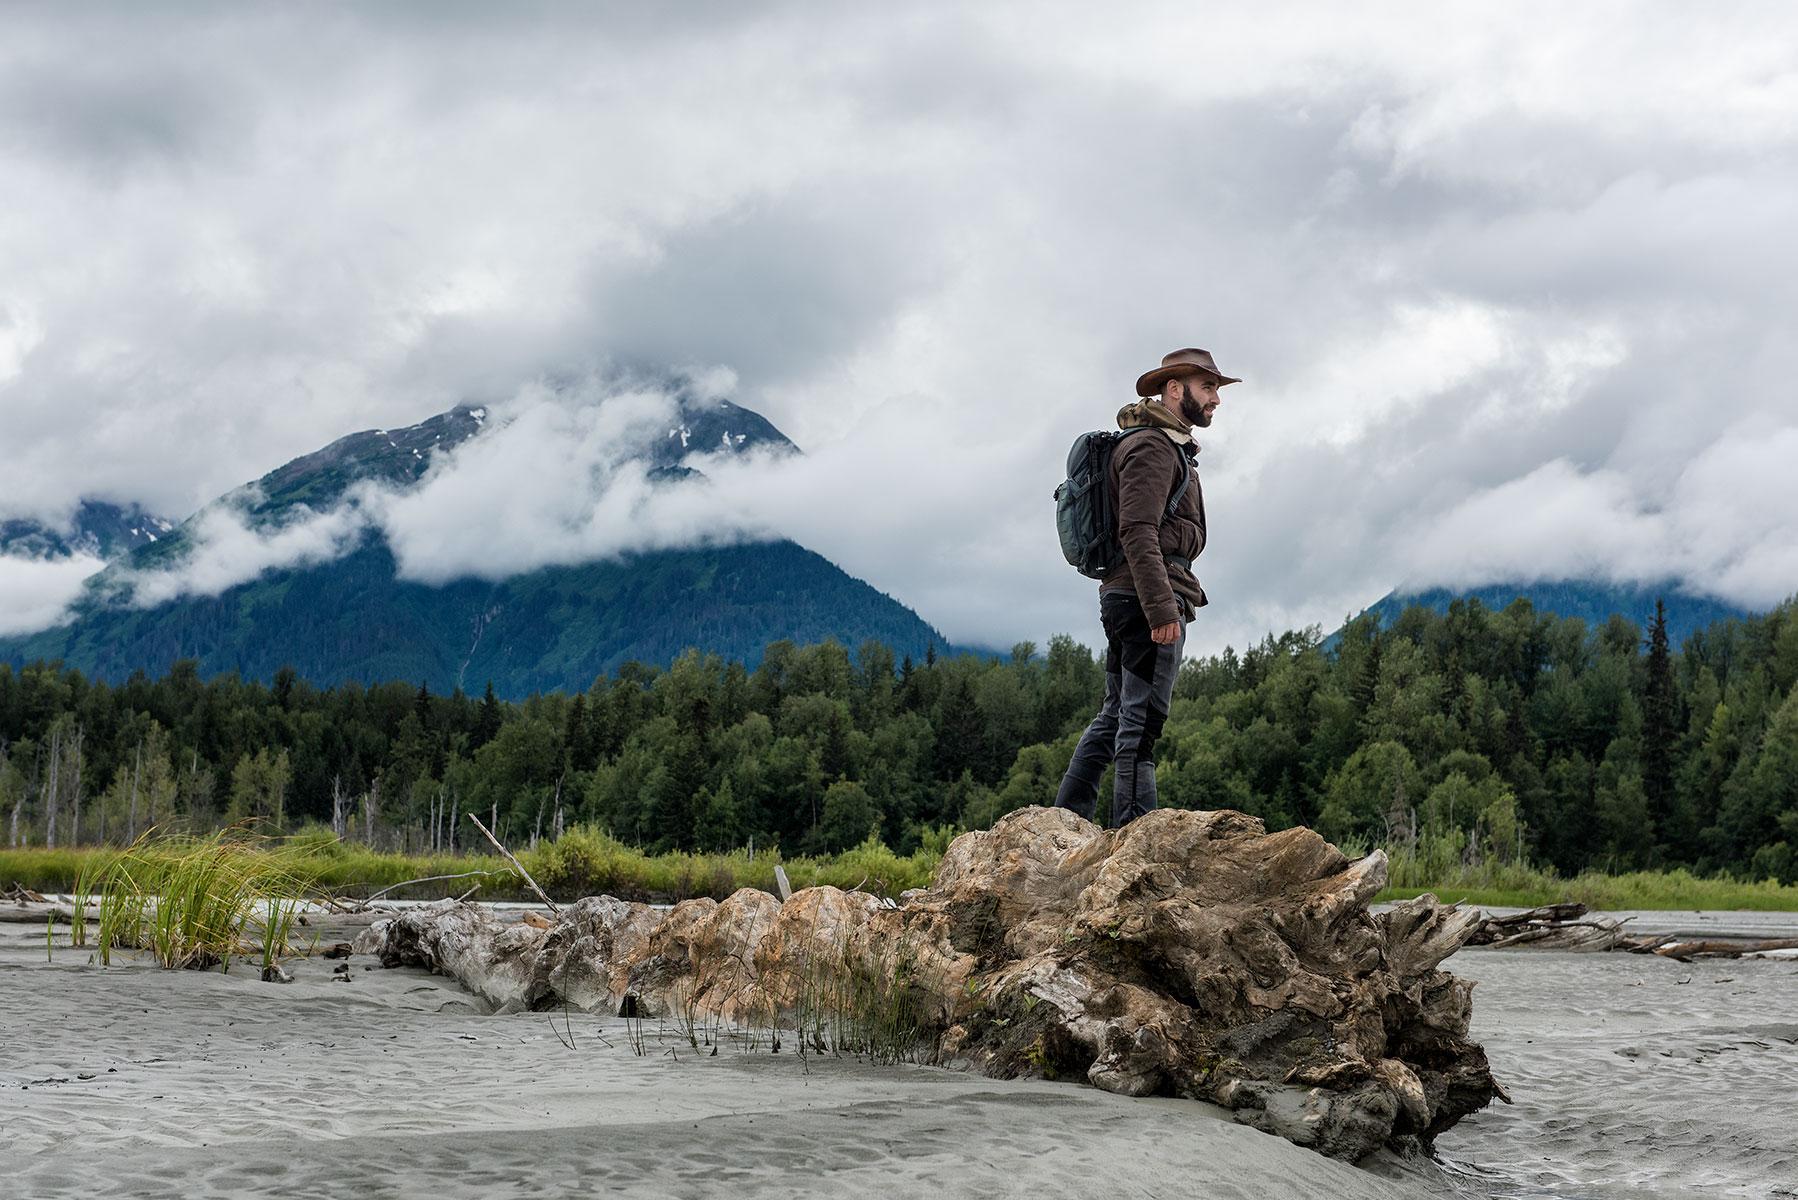 austin-trigg-brave-wilderness-alaska-BW-Coyote-Stands-on-Log.jpg